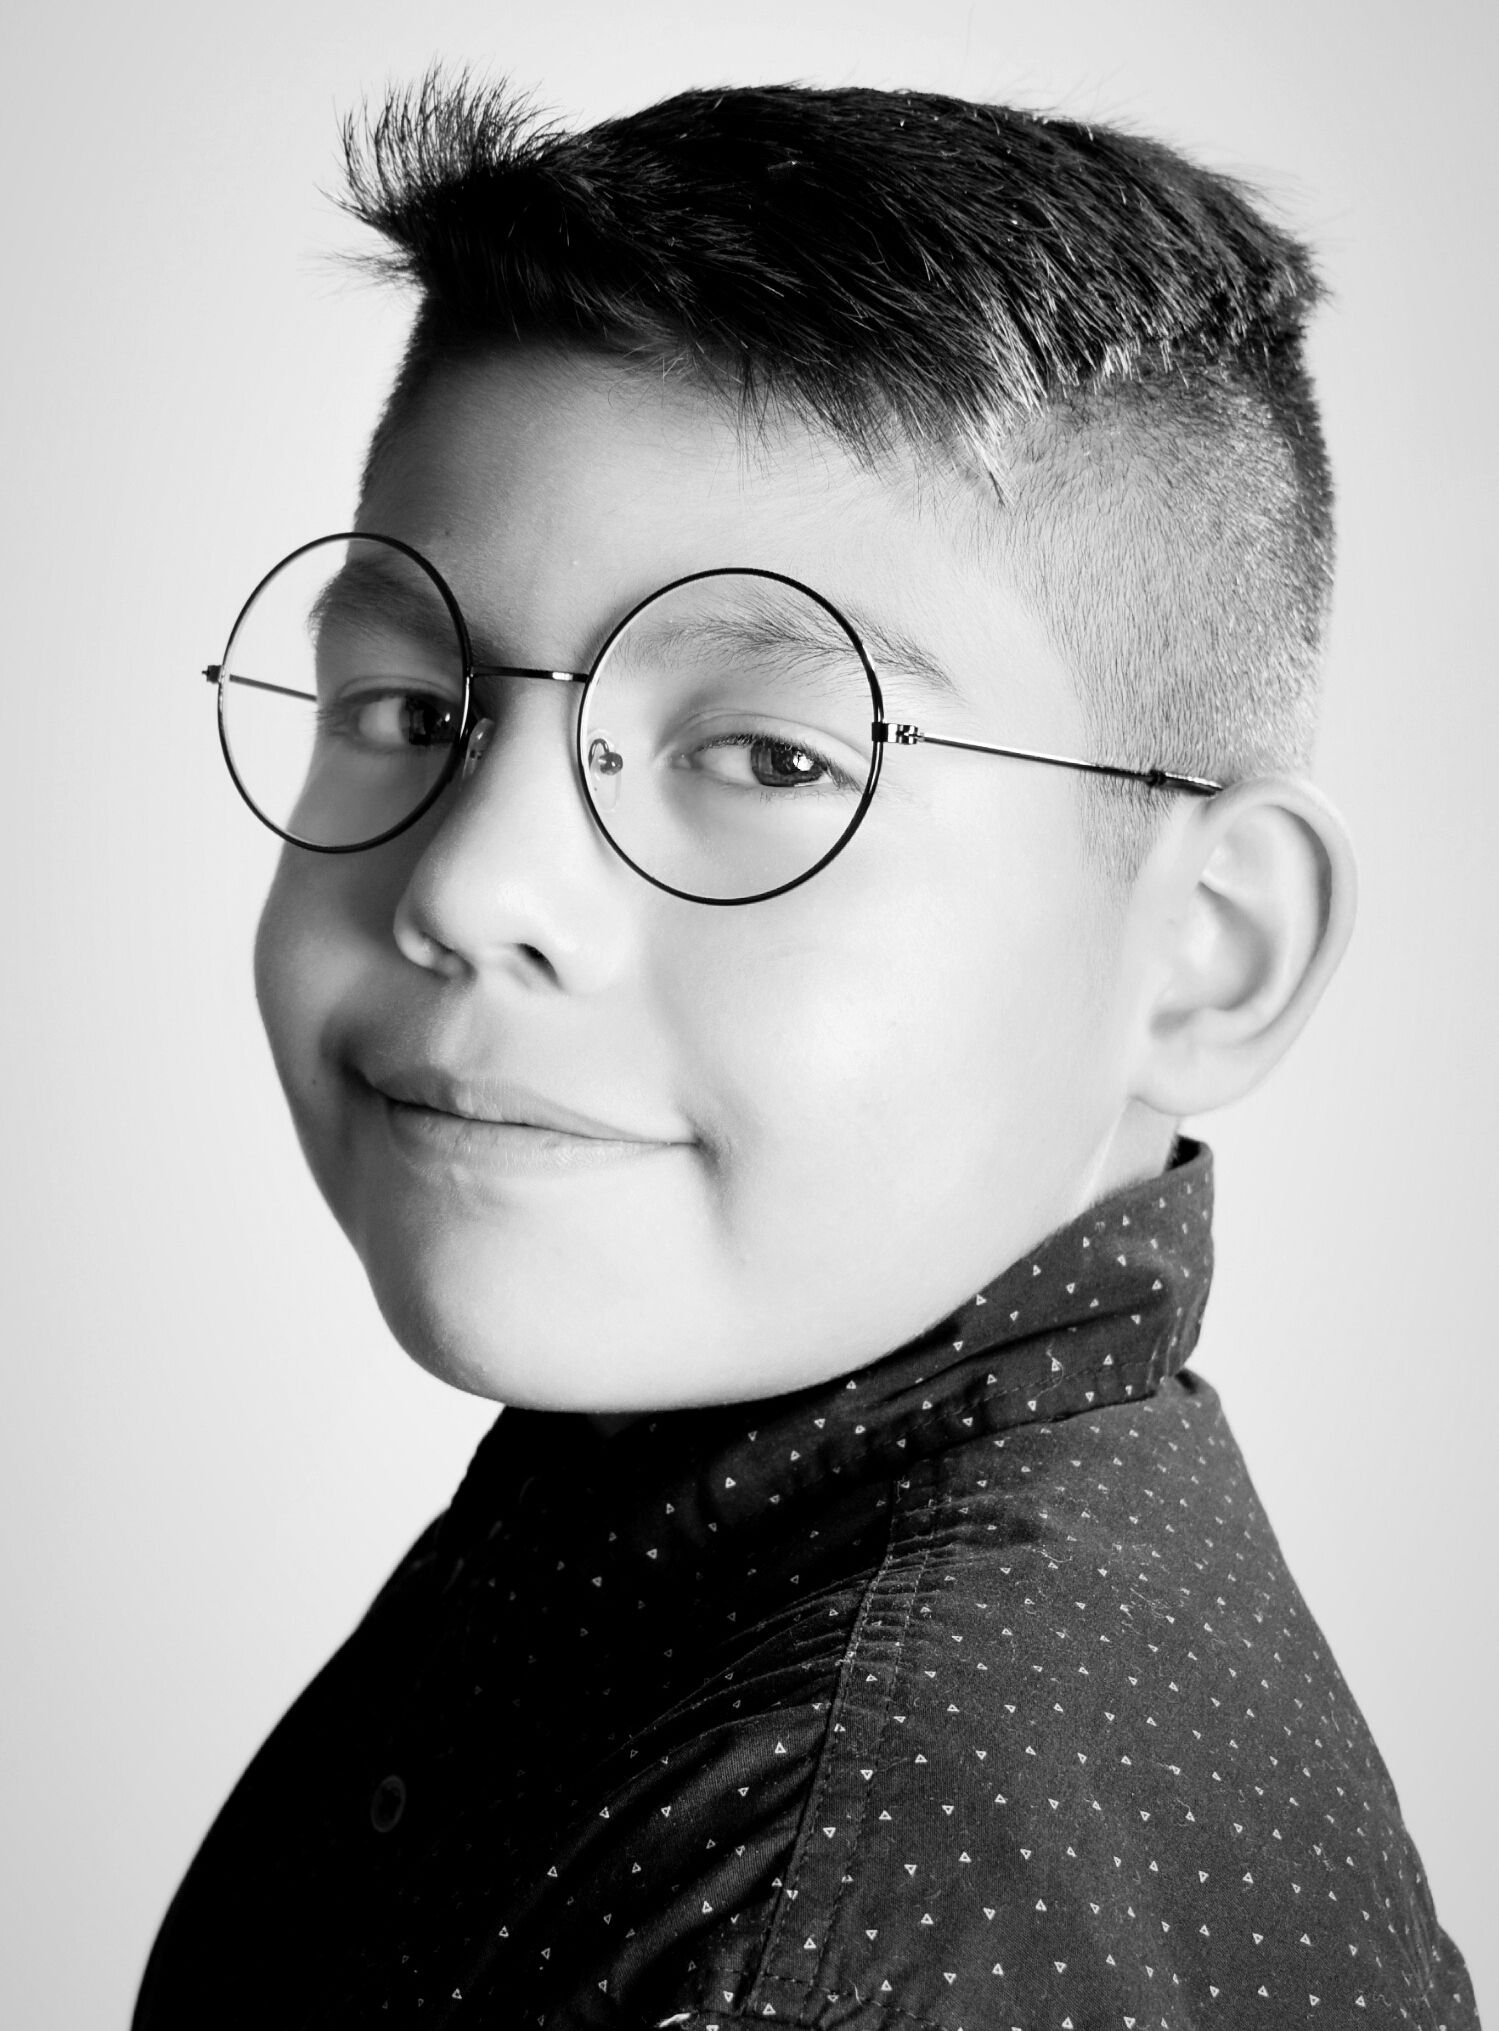 PHO262-Professional Portraiture